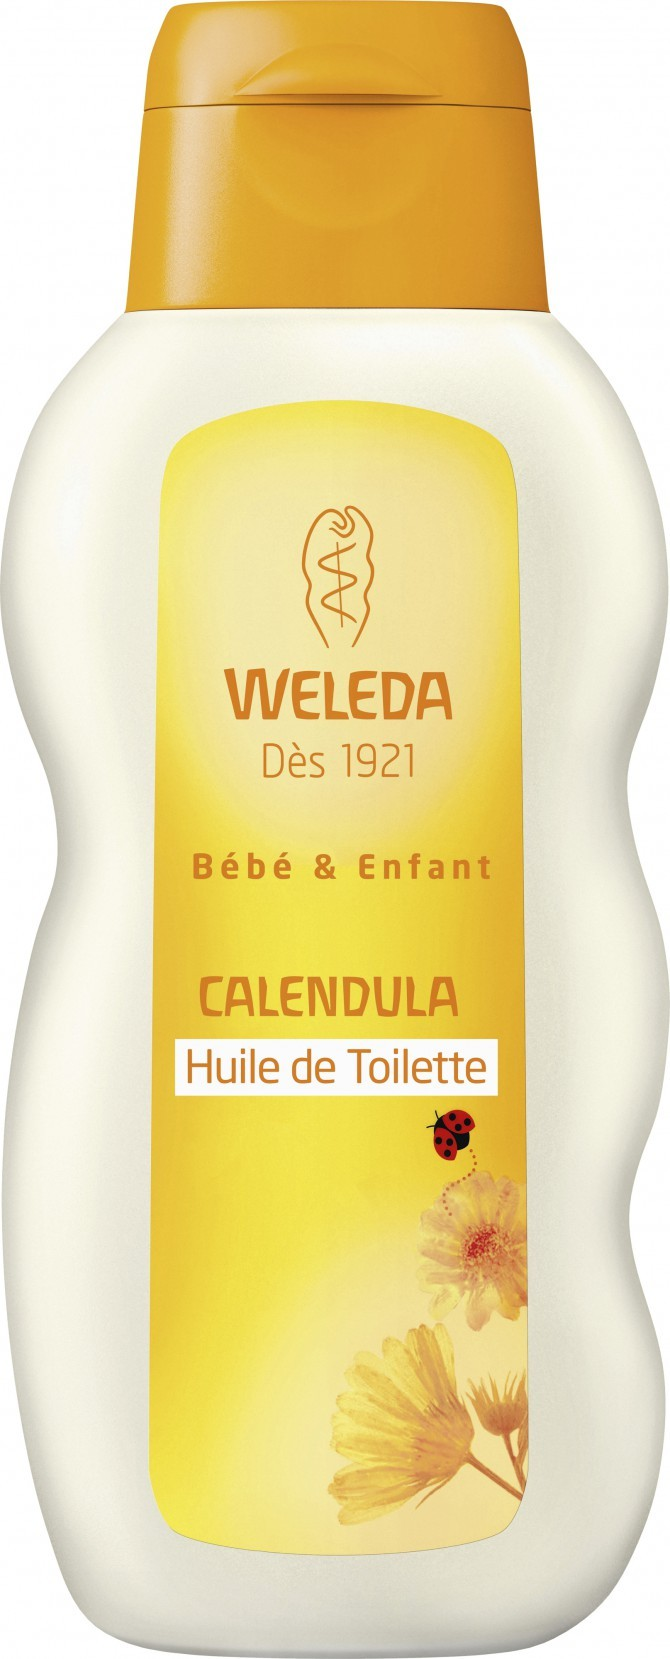 weleda_huile_de_toilette